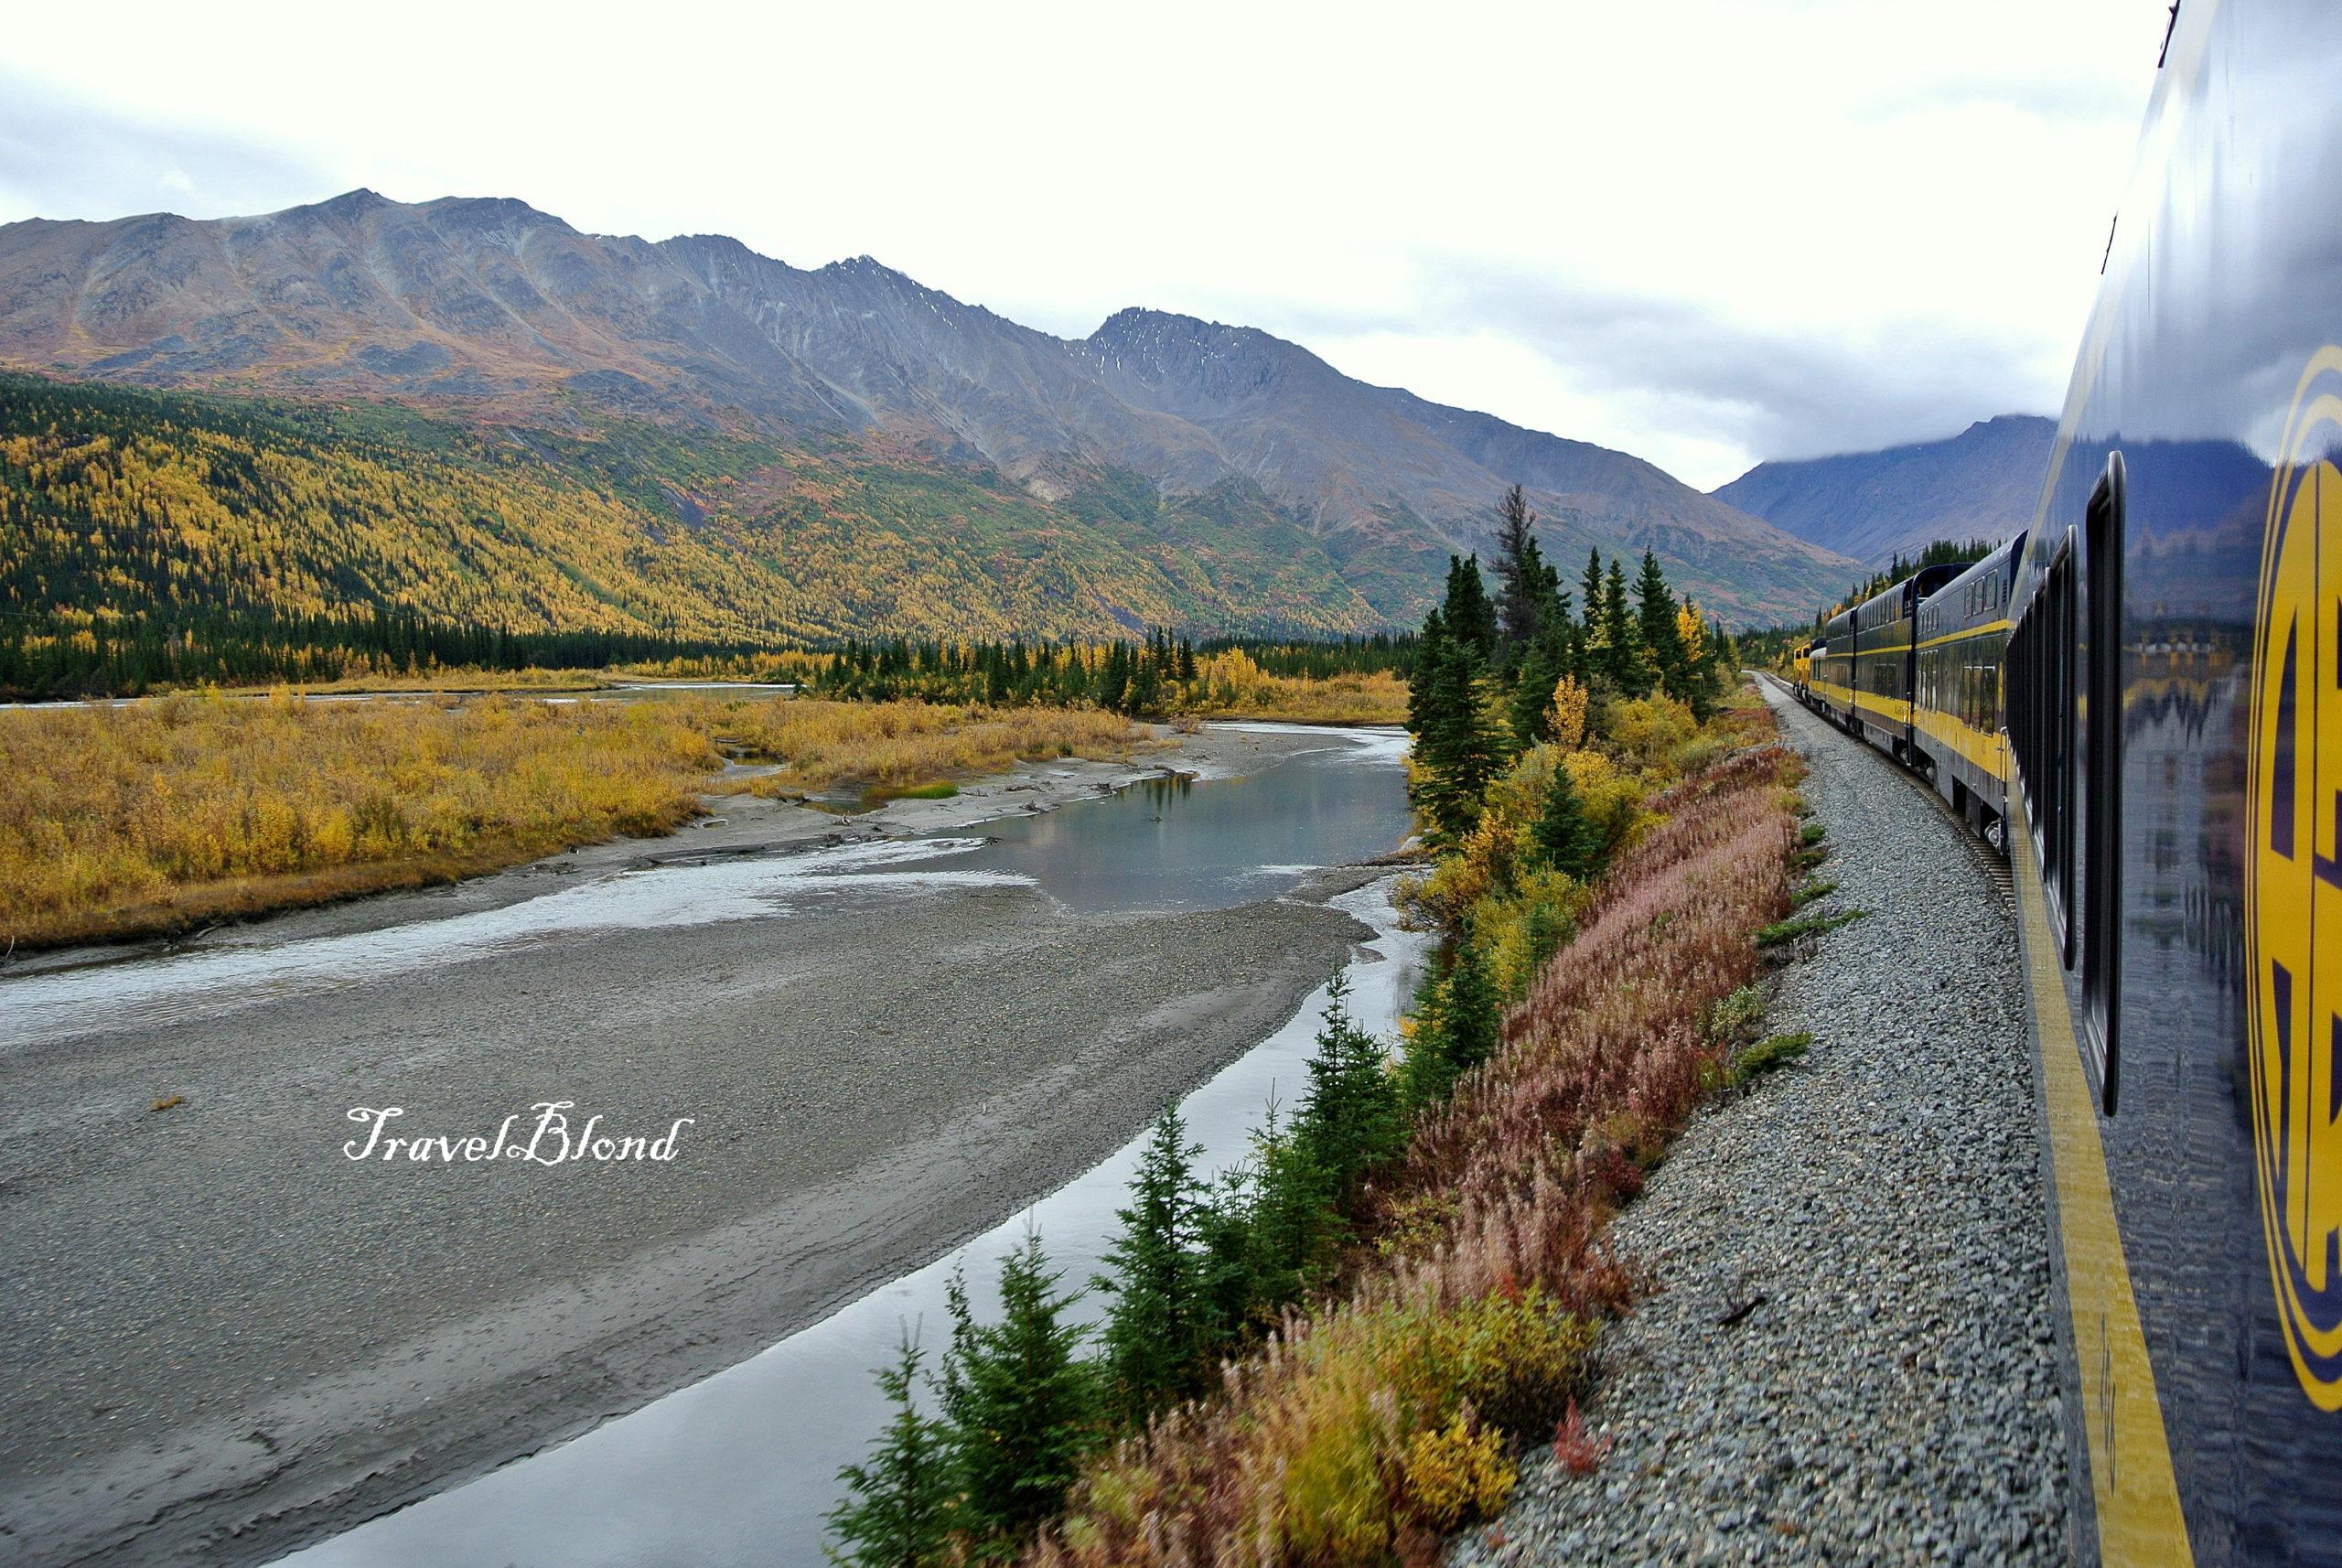 Trainlogo - The Best Hostel In Alaska